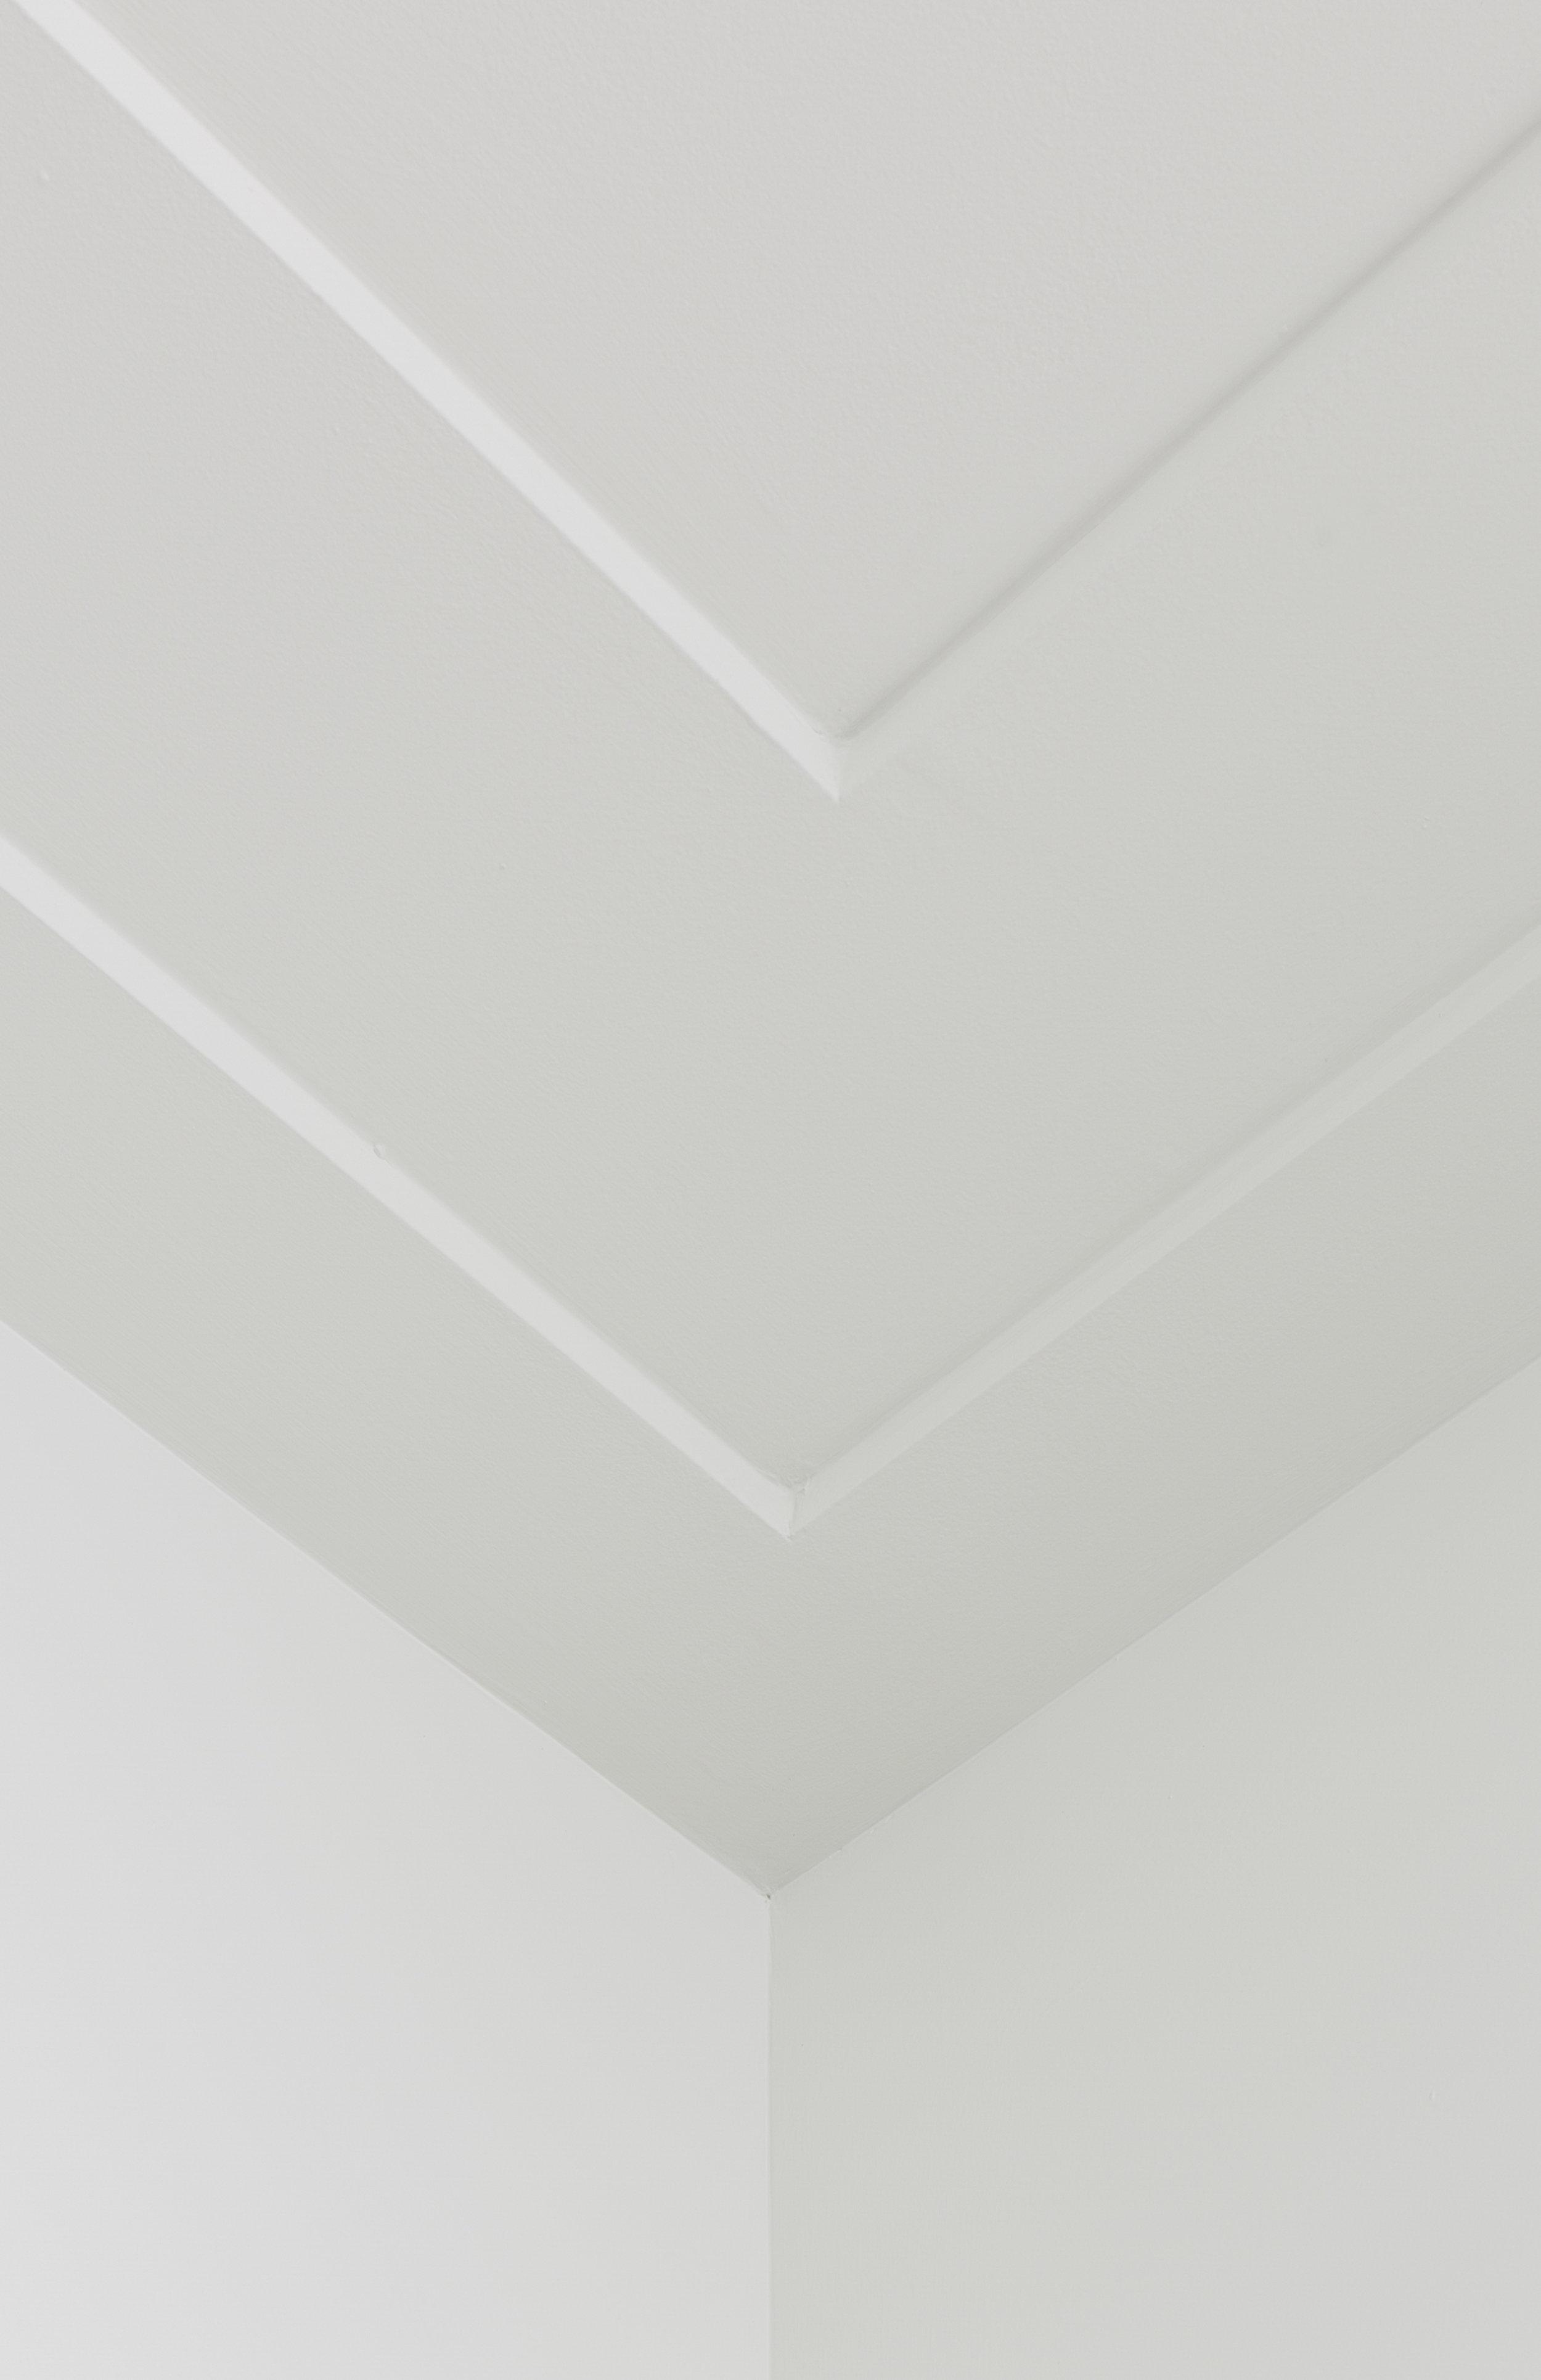 StudioGild_ReagenTaylorPhotography(12).jpg